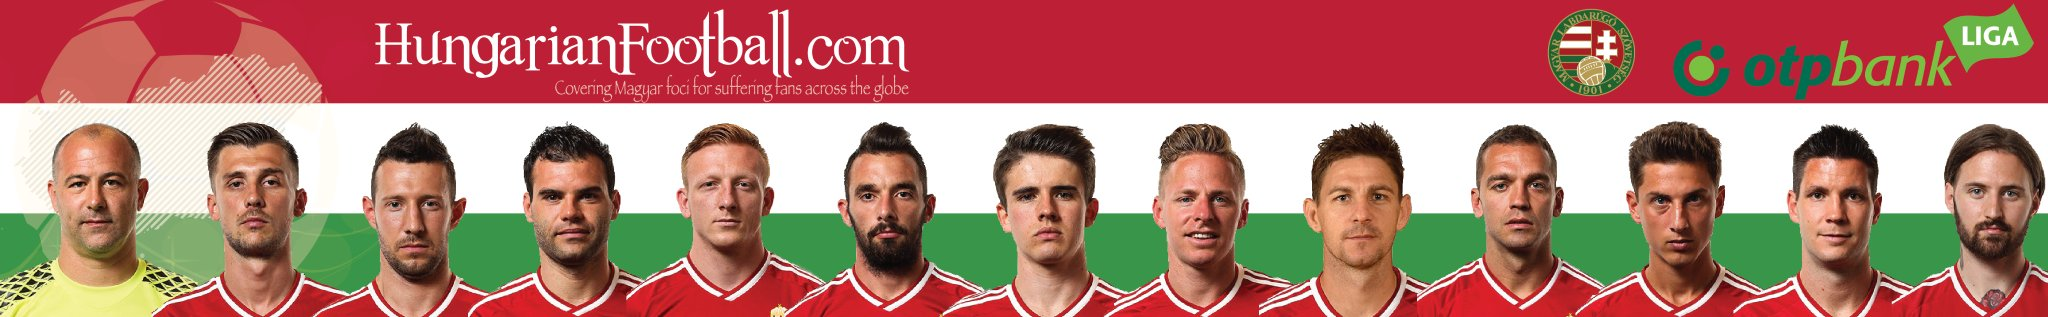 HungarianFootball.com |